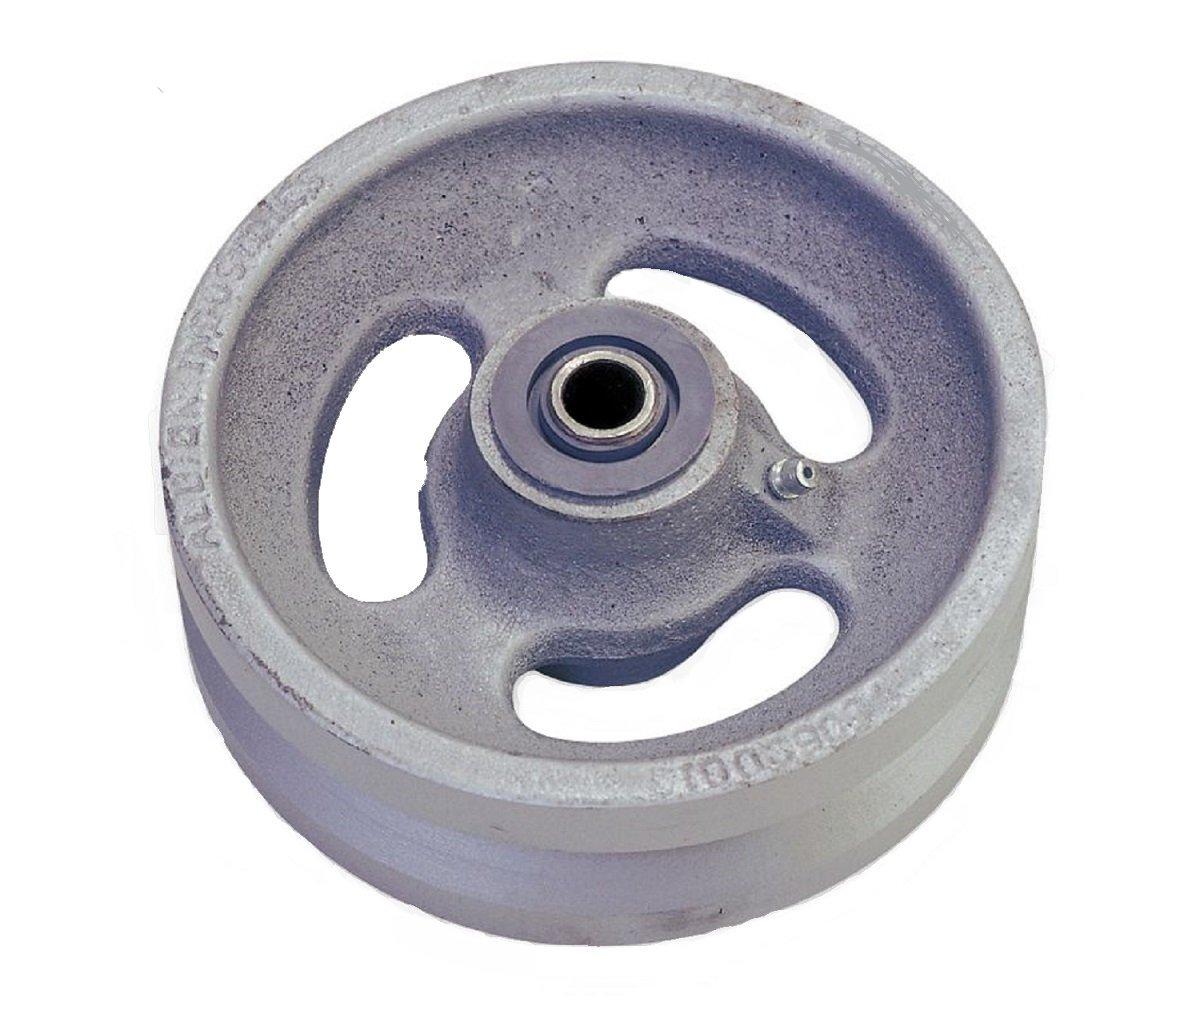 Albion VG0620112 6'' Cast Iron V-Groove Caster Wheel, 2'' Tread Width, Roller Bearing, 1000 lb. Capacity